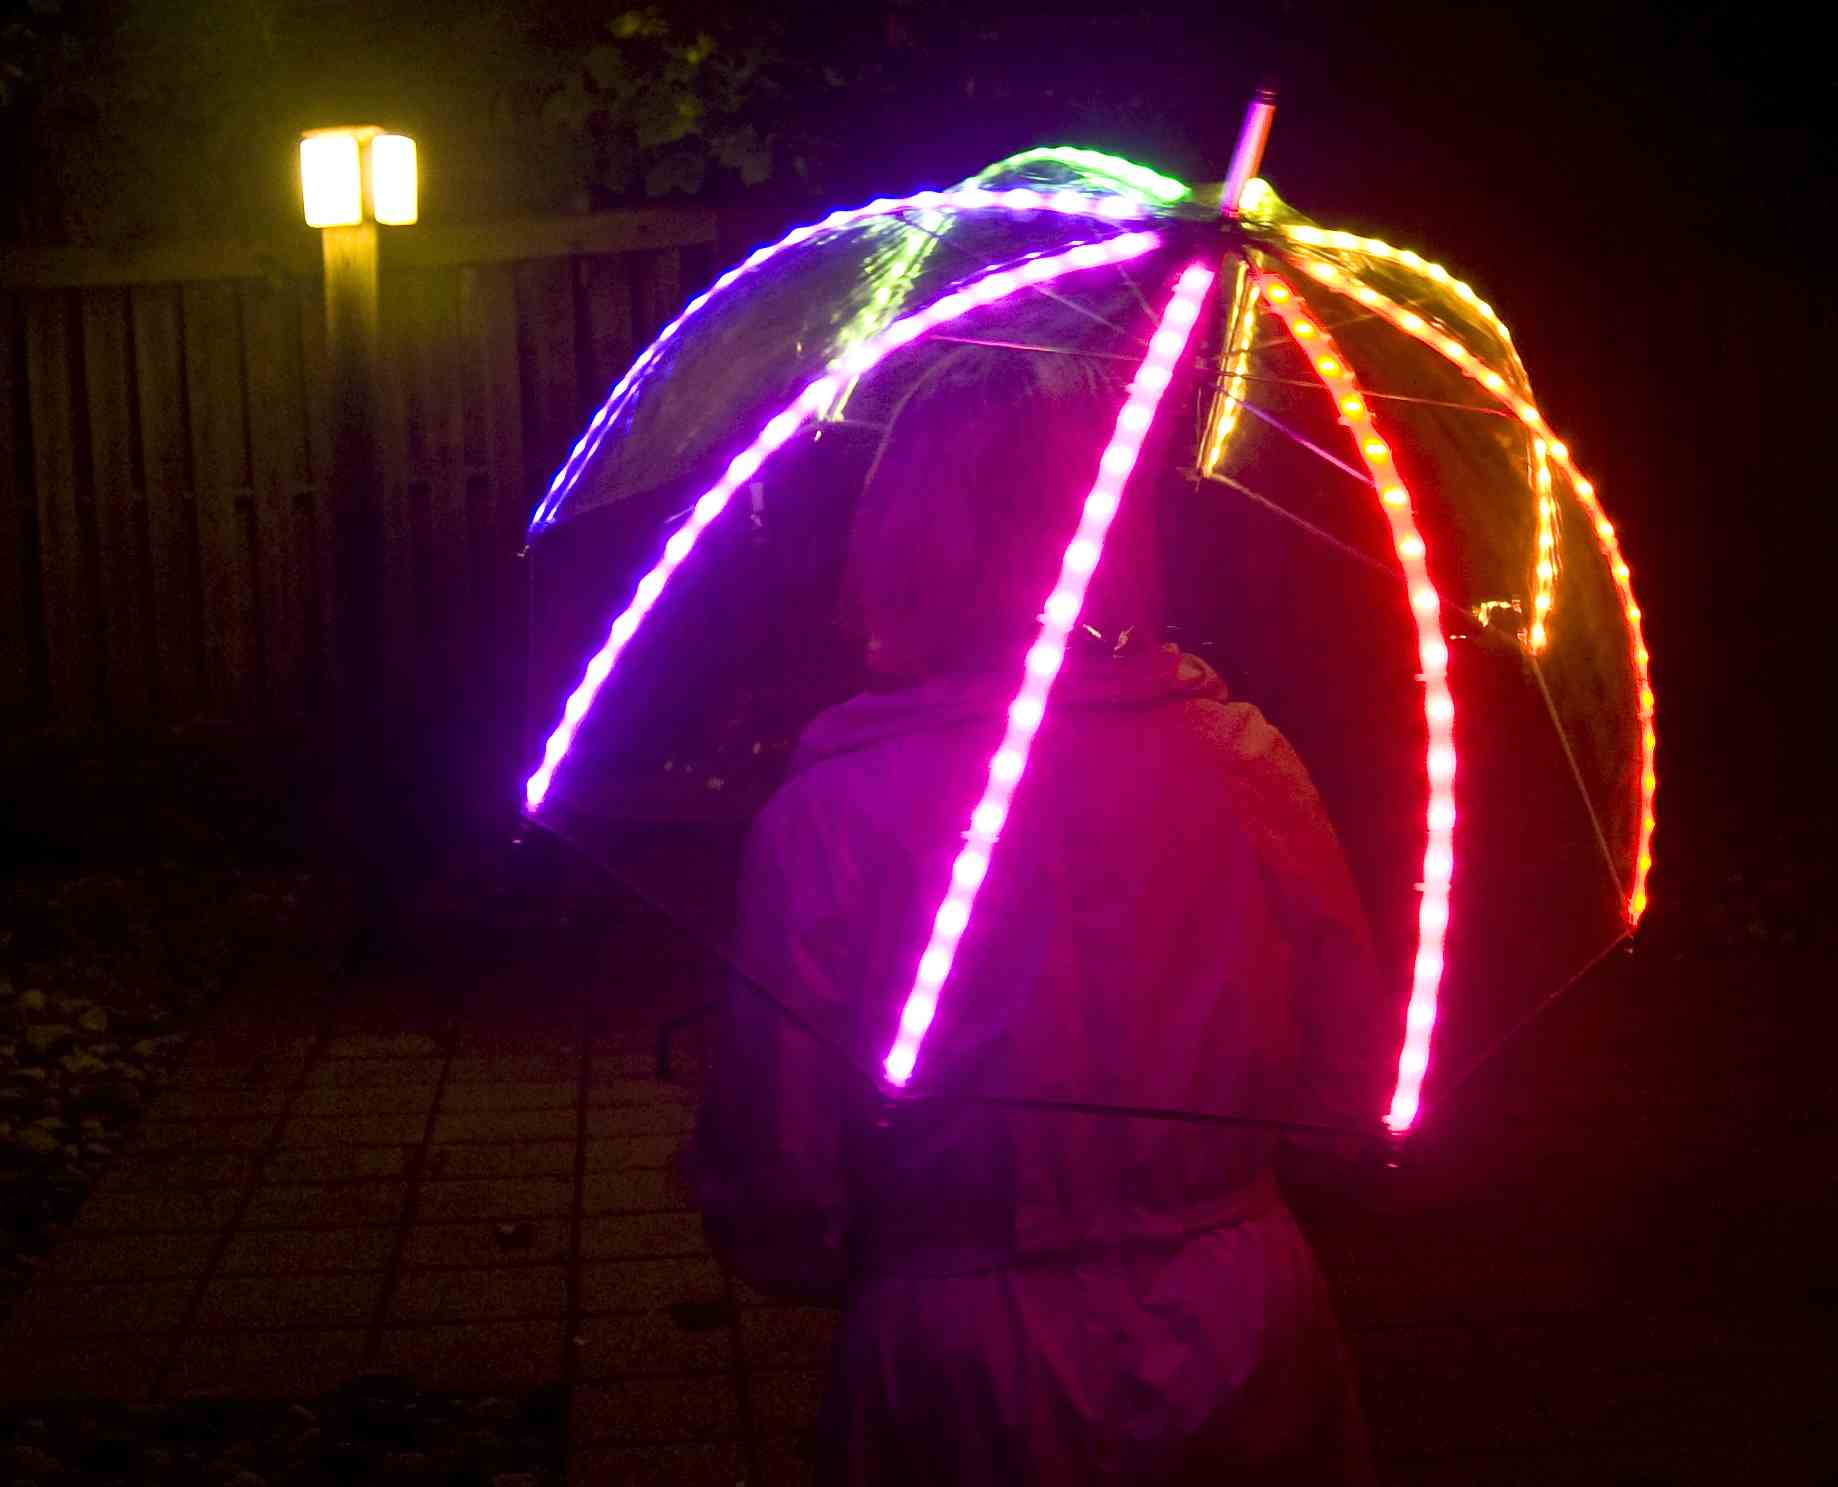 Wearable Medical Technology LED umbrella wins wear...